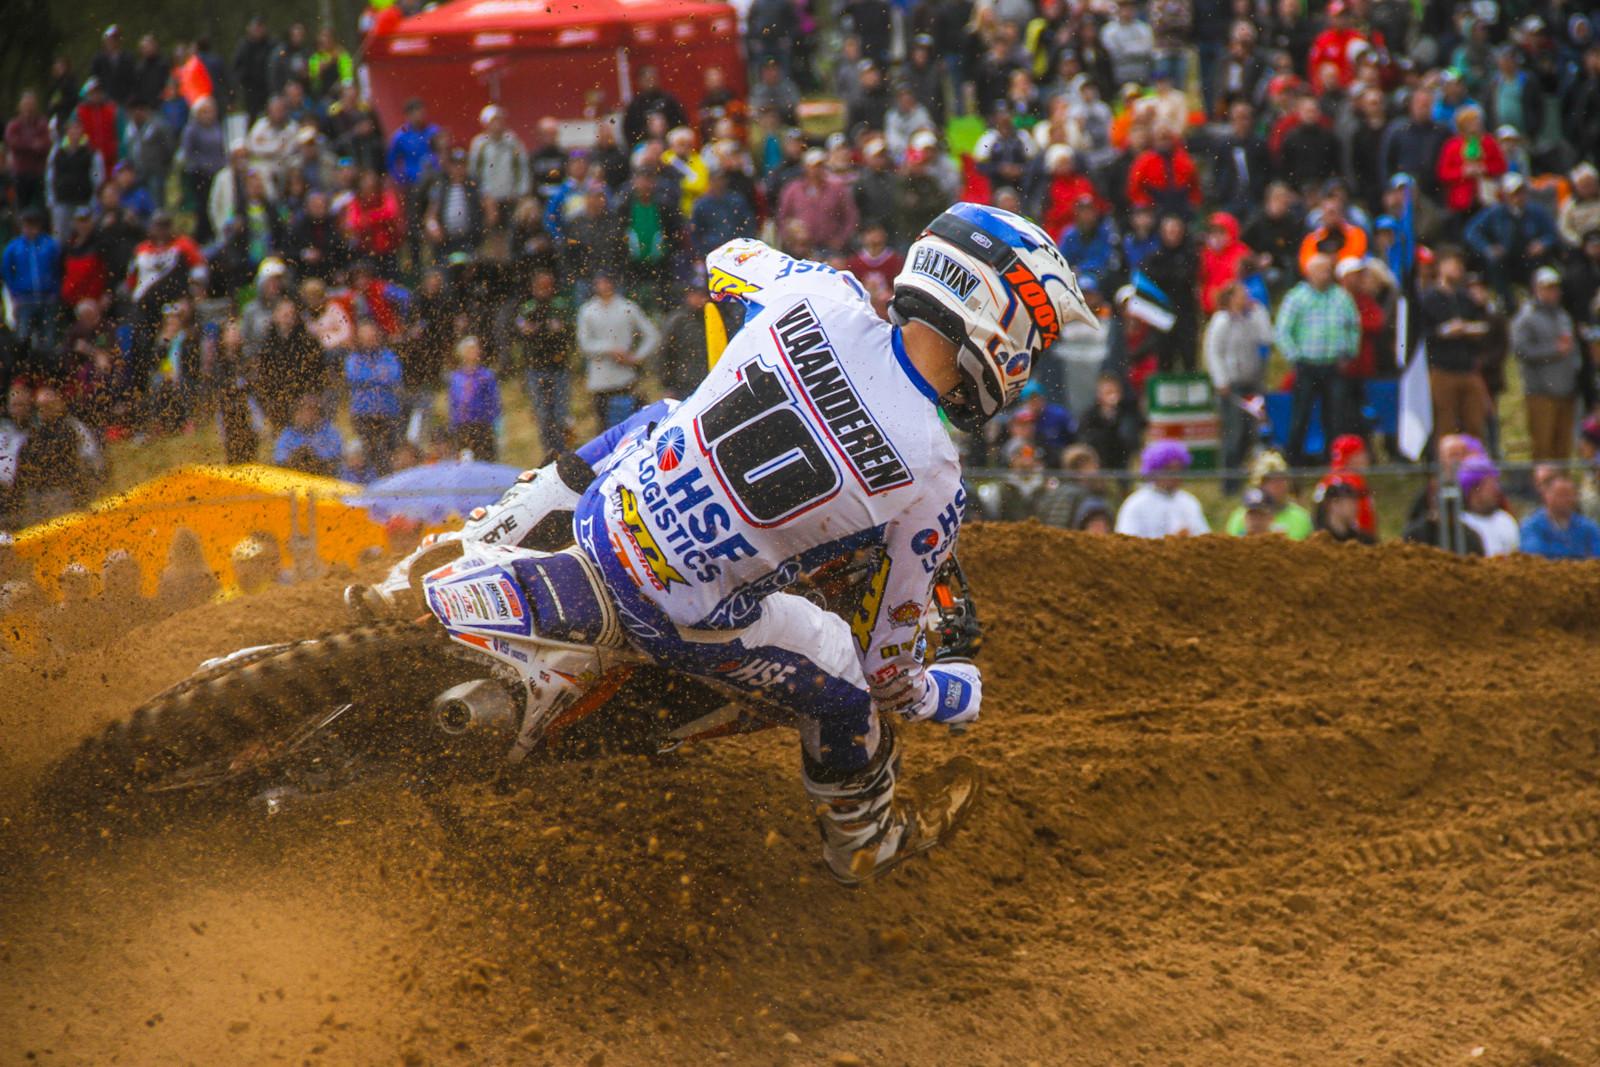 Calvin Vlaanderen - Photo Blast: 2017 MXGP of Latvia - Motocross Pictures - Vital MX